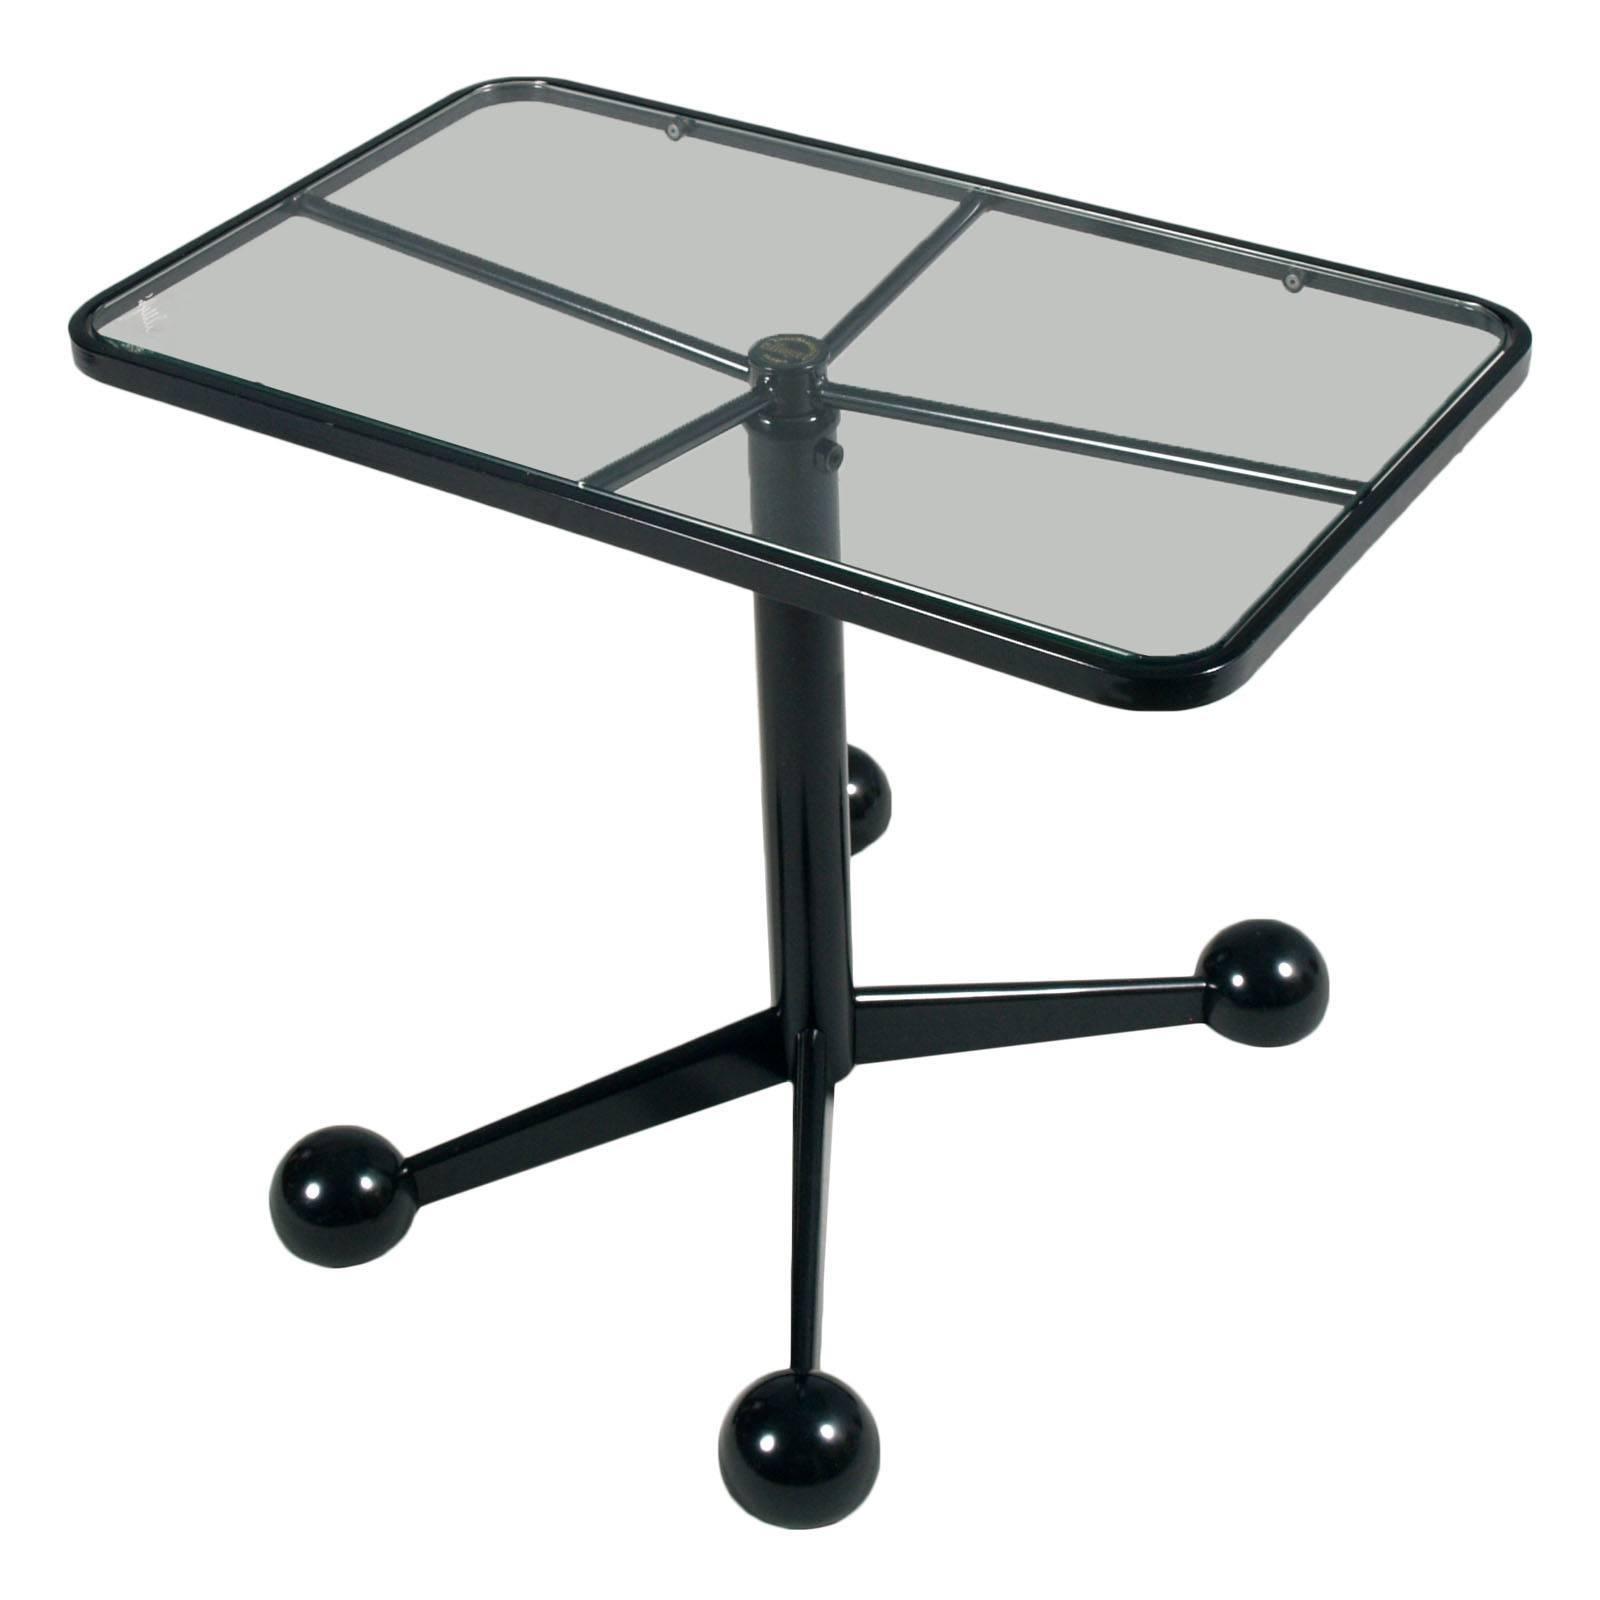 Modern Bar Cart or Side Coffee Rolling Table Adjustable Height Design Allegri